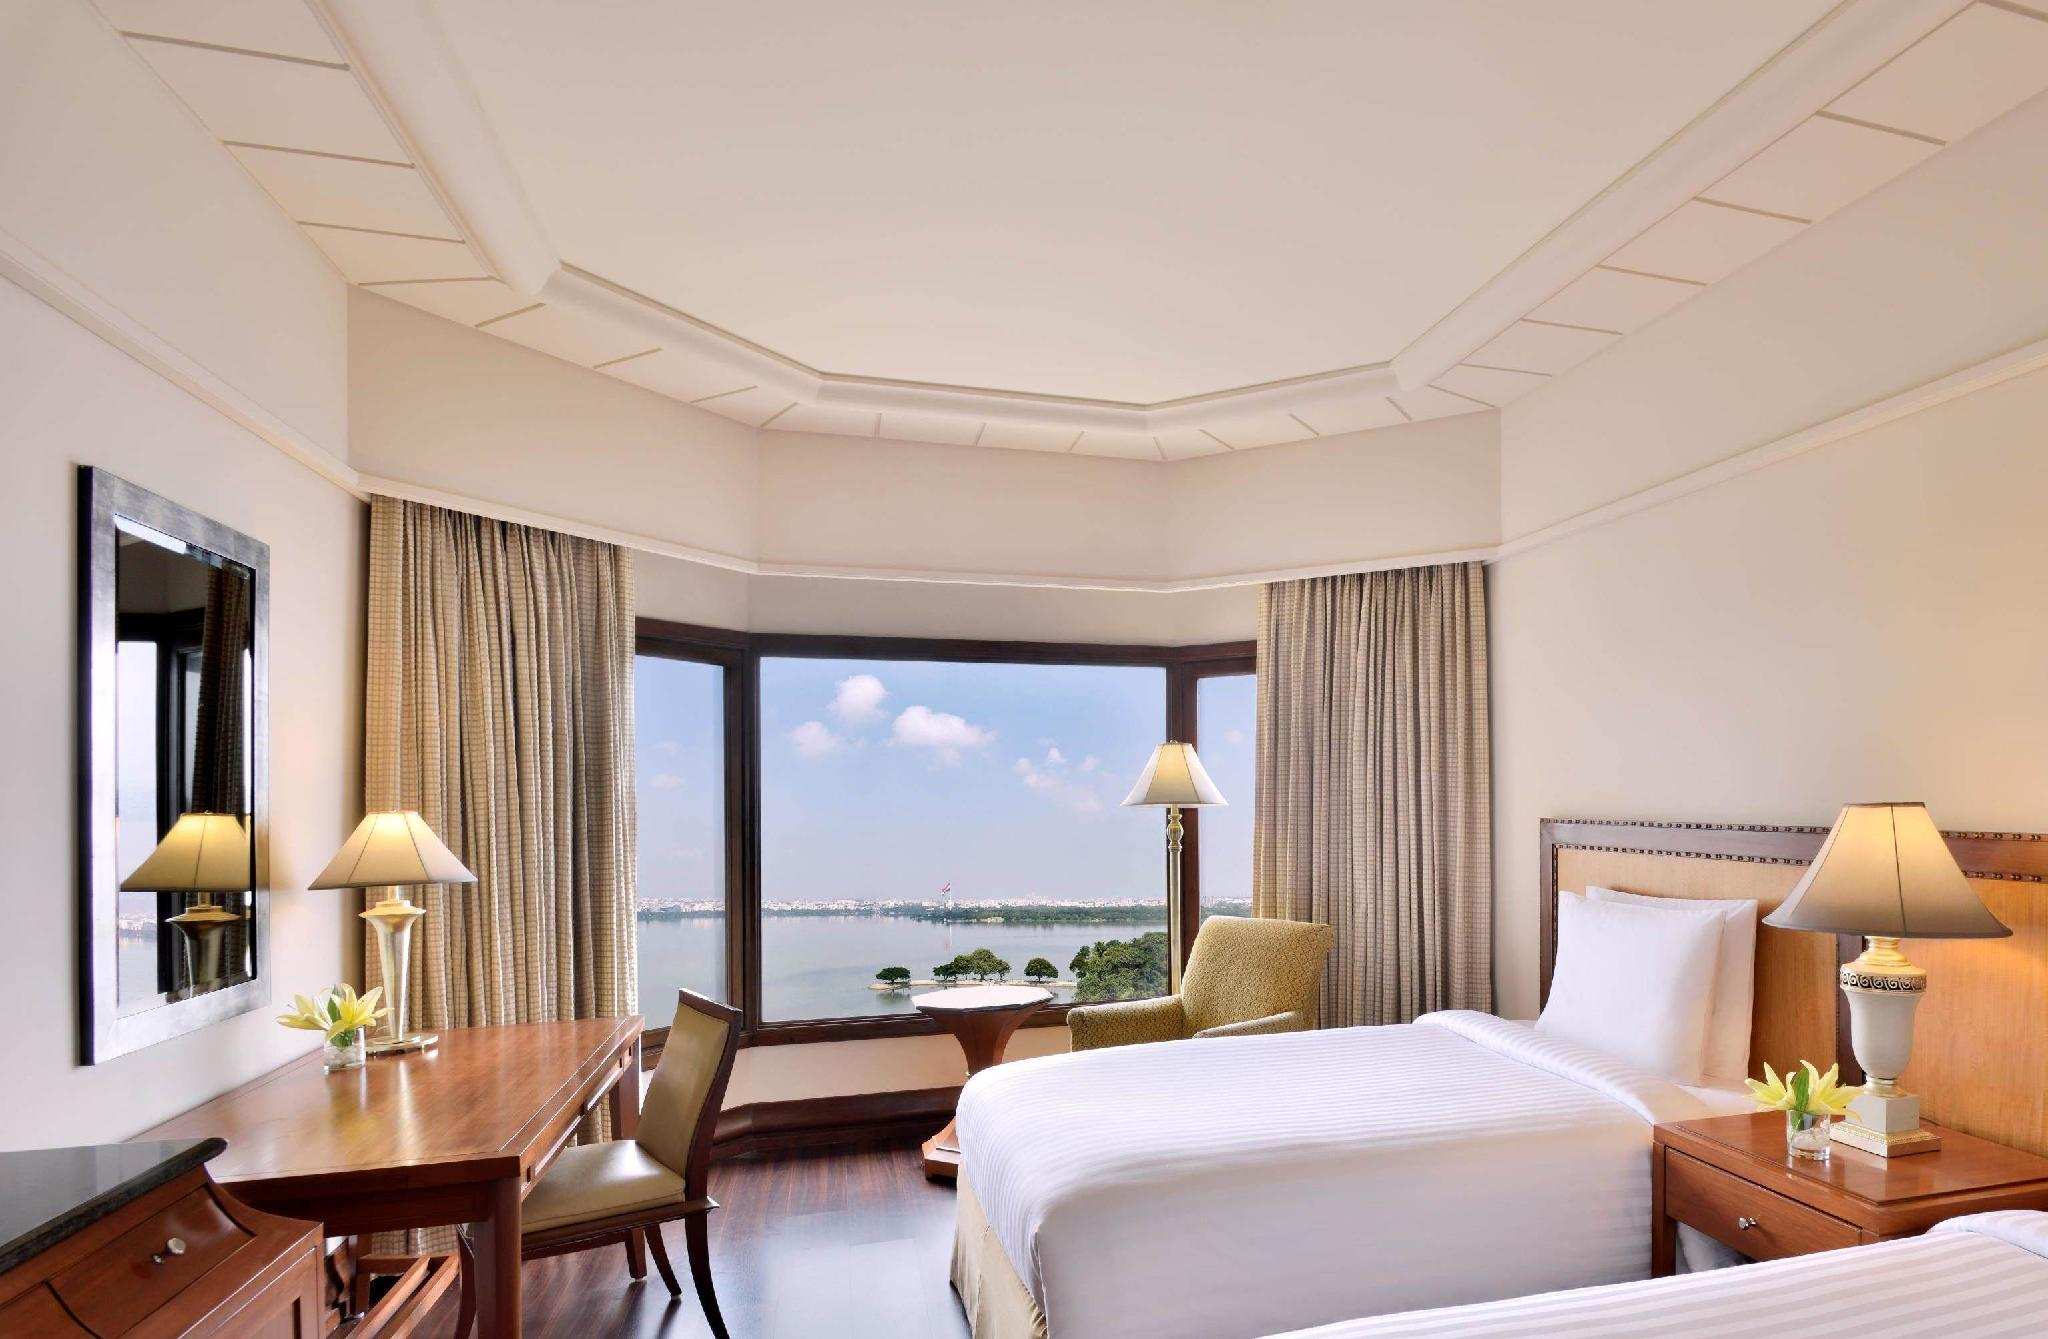 Hyderabad Marriott Hotel & Convention Centre, Hyderabad